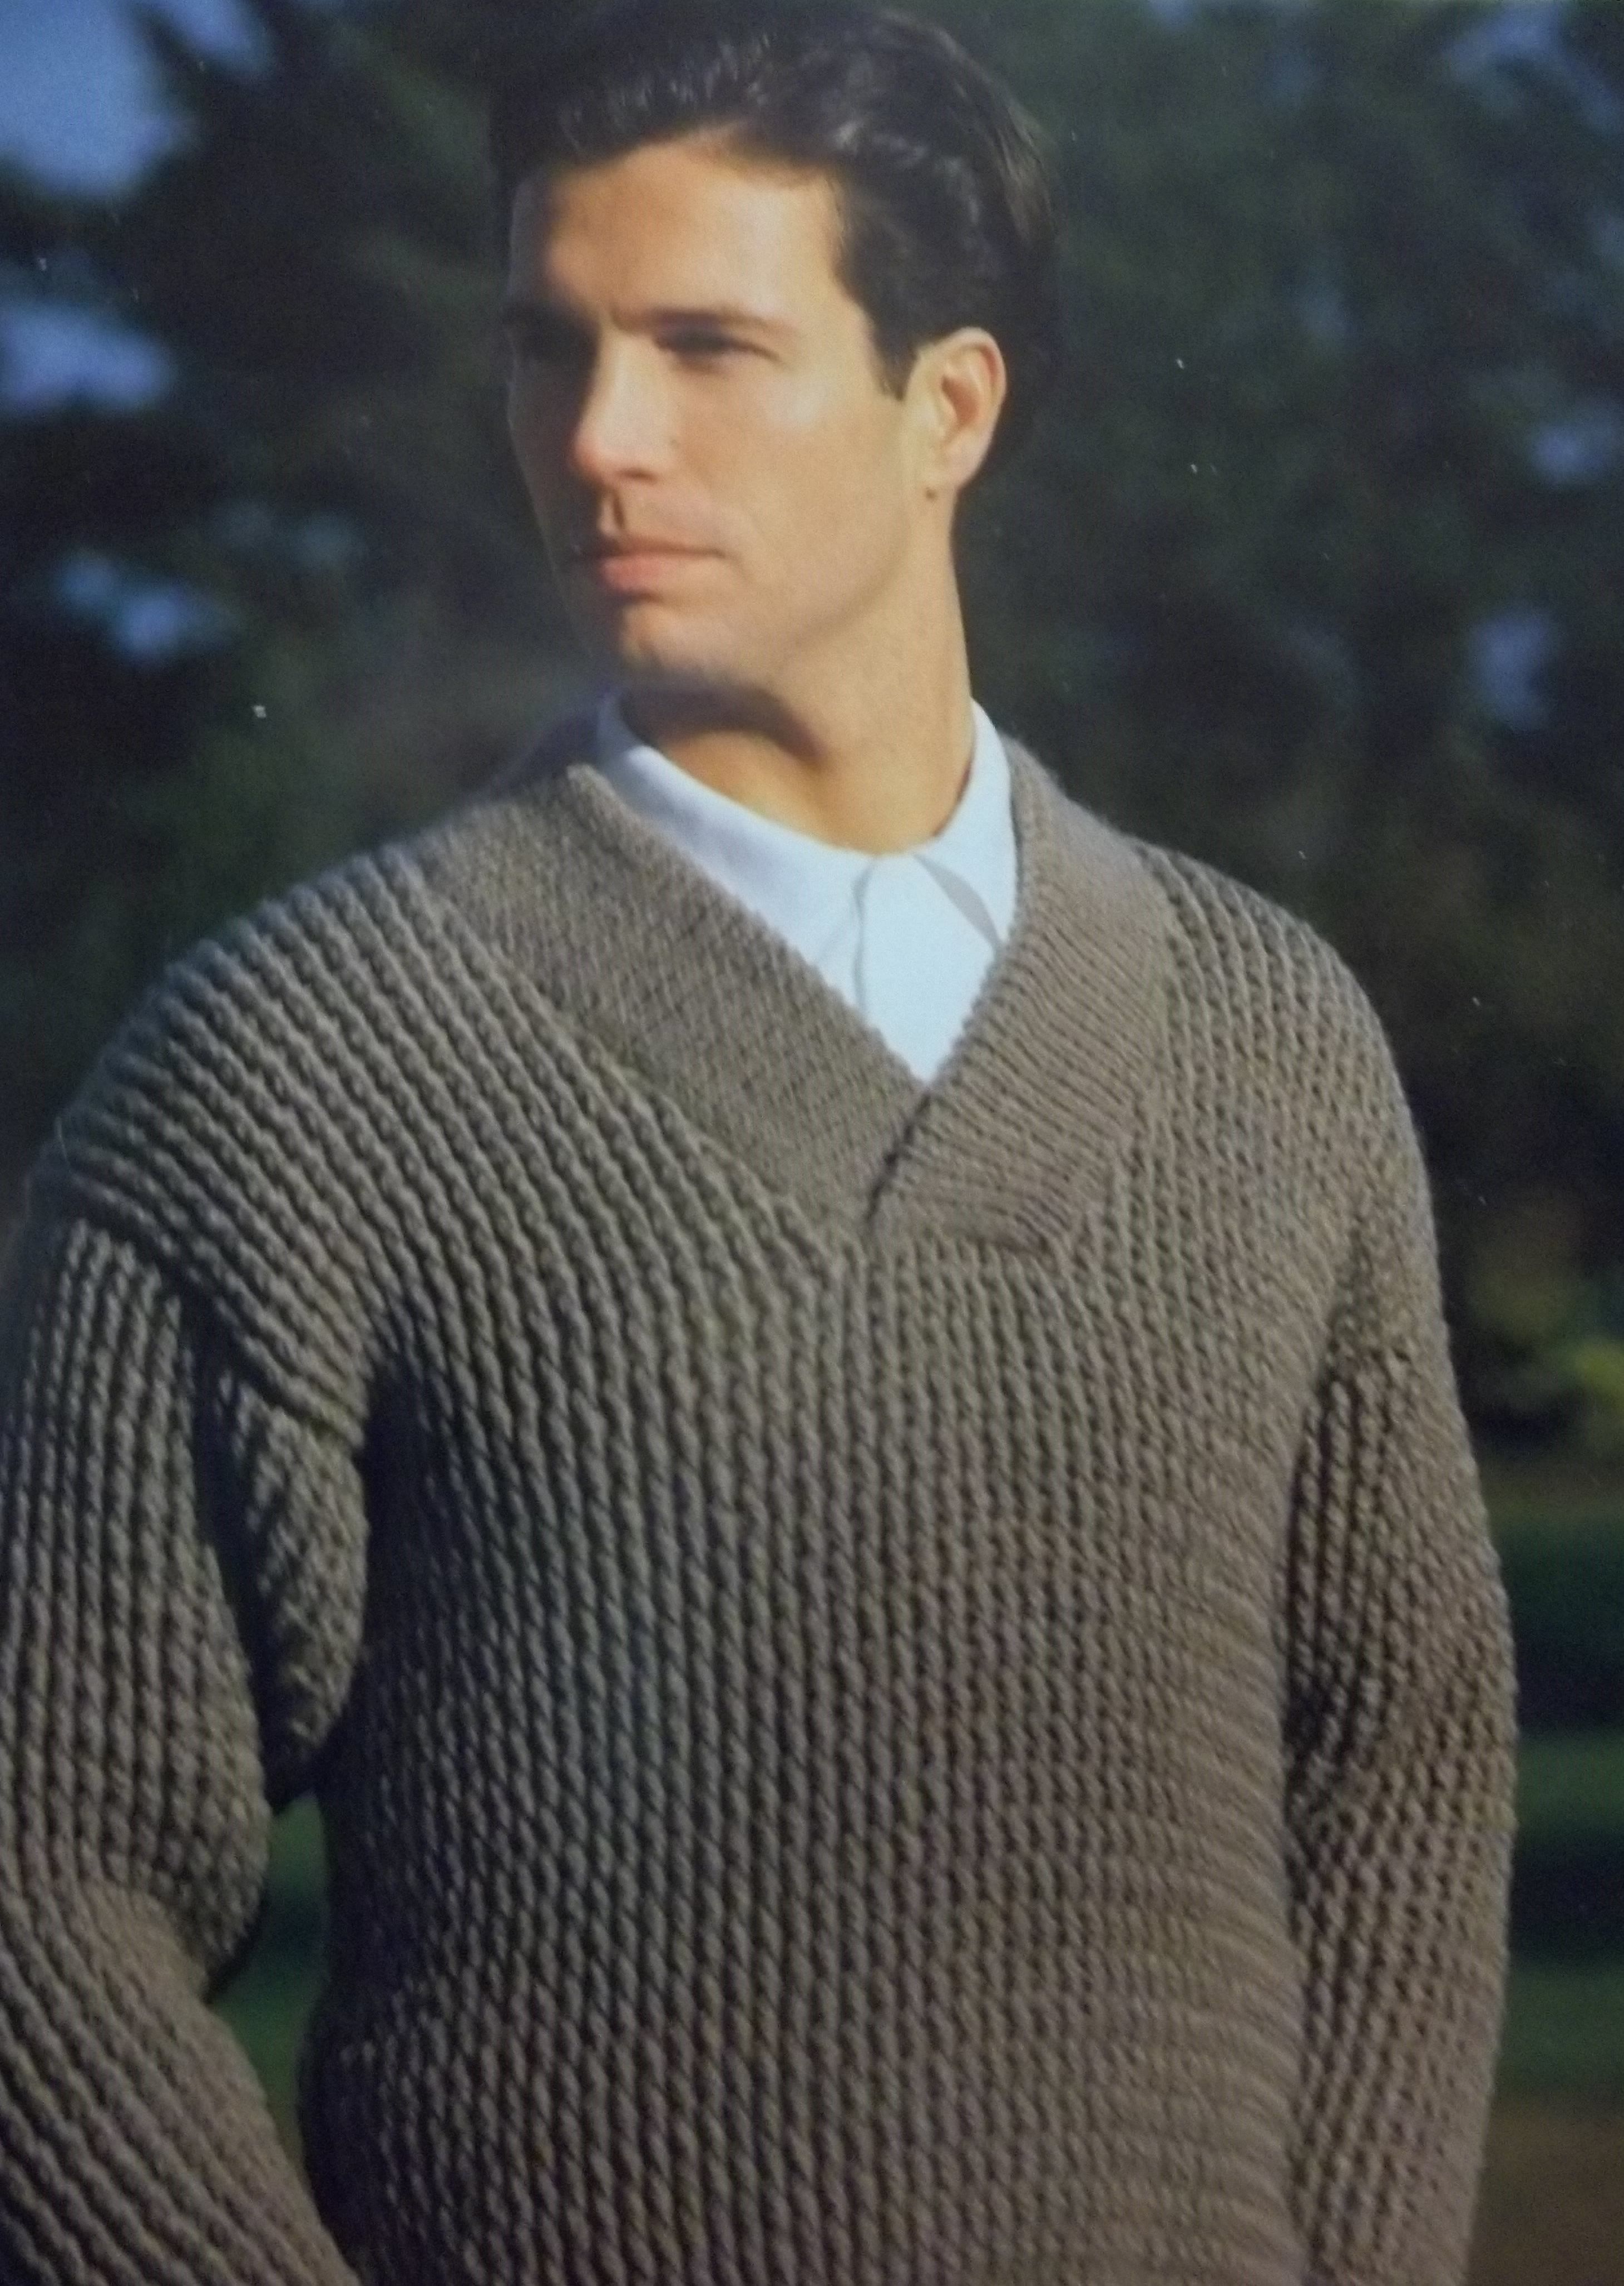 Free crochet pattern vintage vogue mens crocheted shawl collar free crochet pattern vintage vogue mens crocheted shawl collar sweater bankloansurffo Choice Image